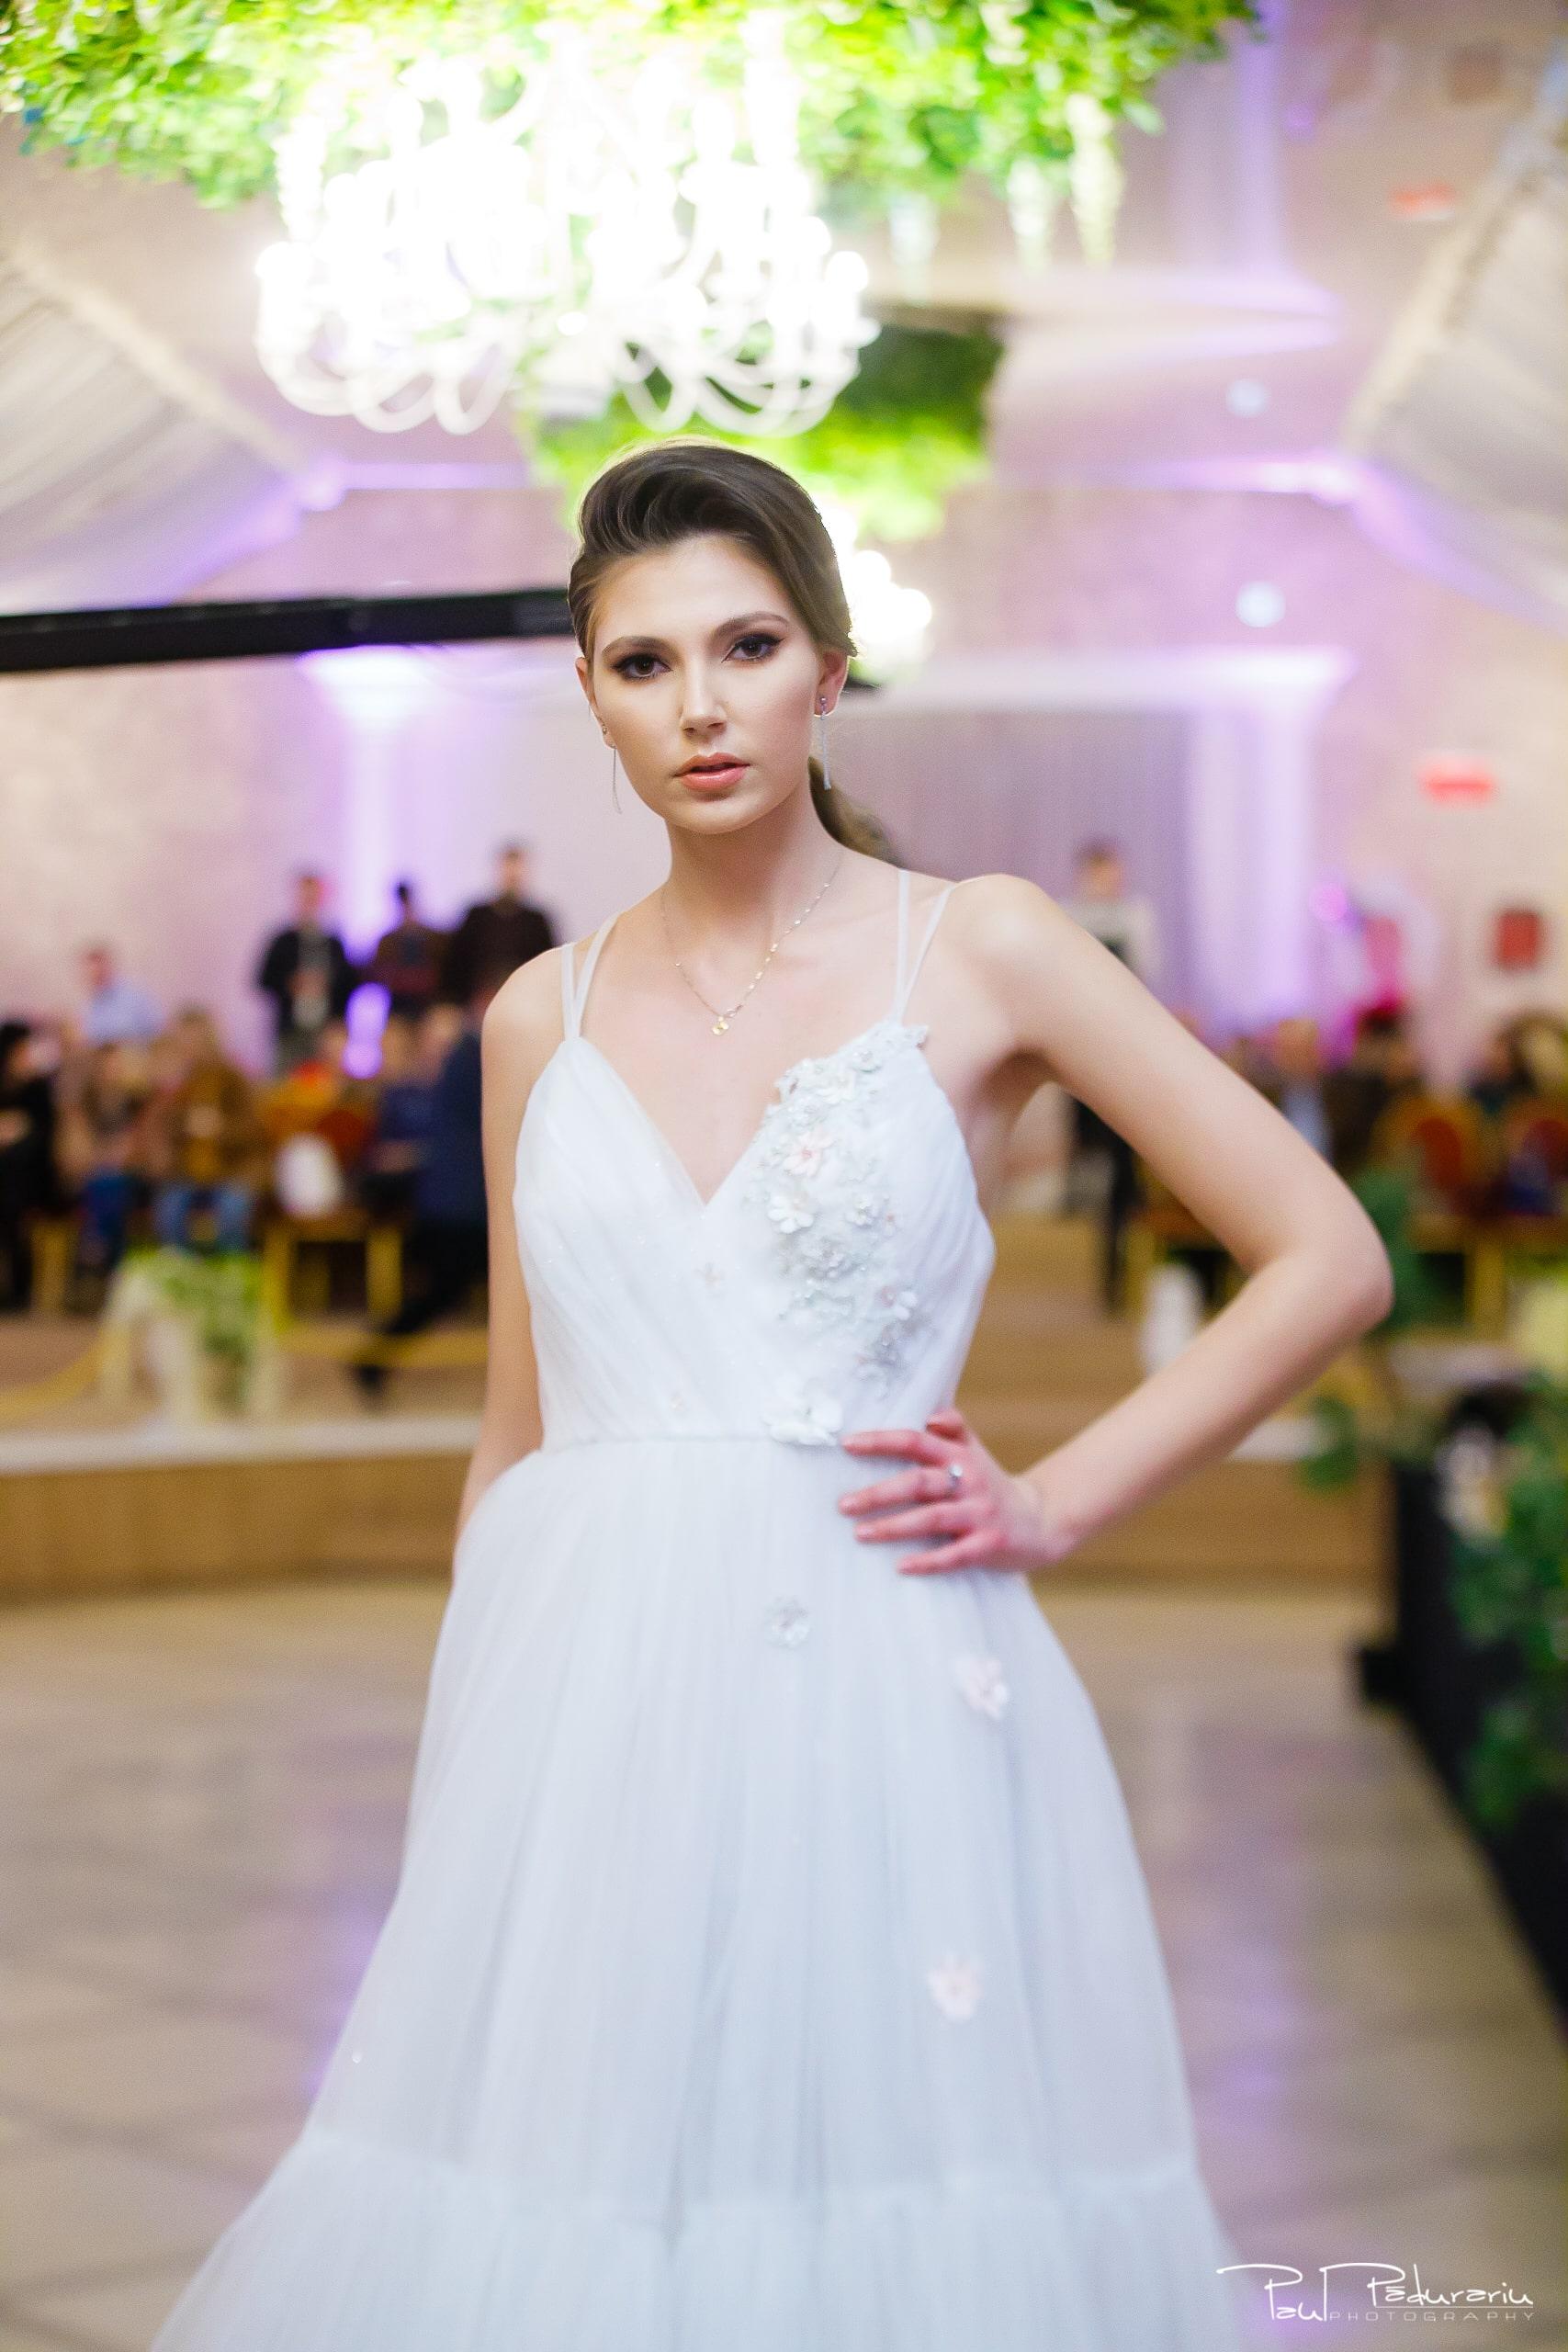 Modern Bride Edith Val colectie rochie mireasa 2019 - fotograf profesionist iasi paul padurariu | nunta iasi 1